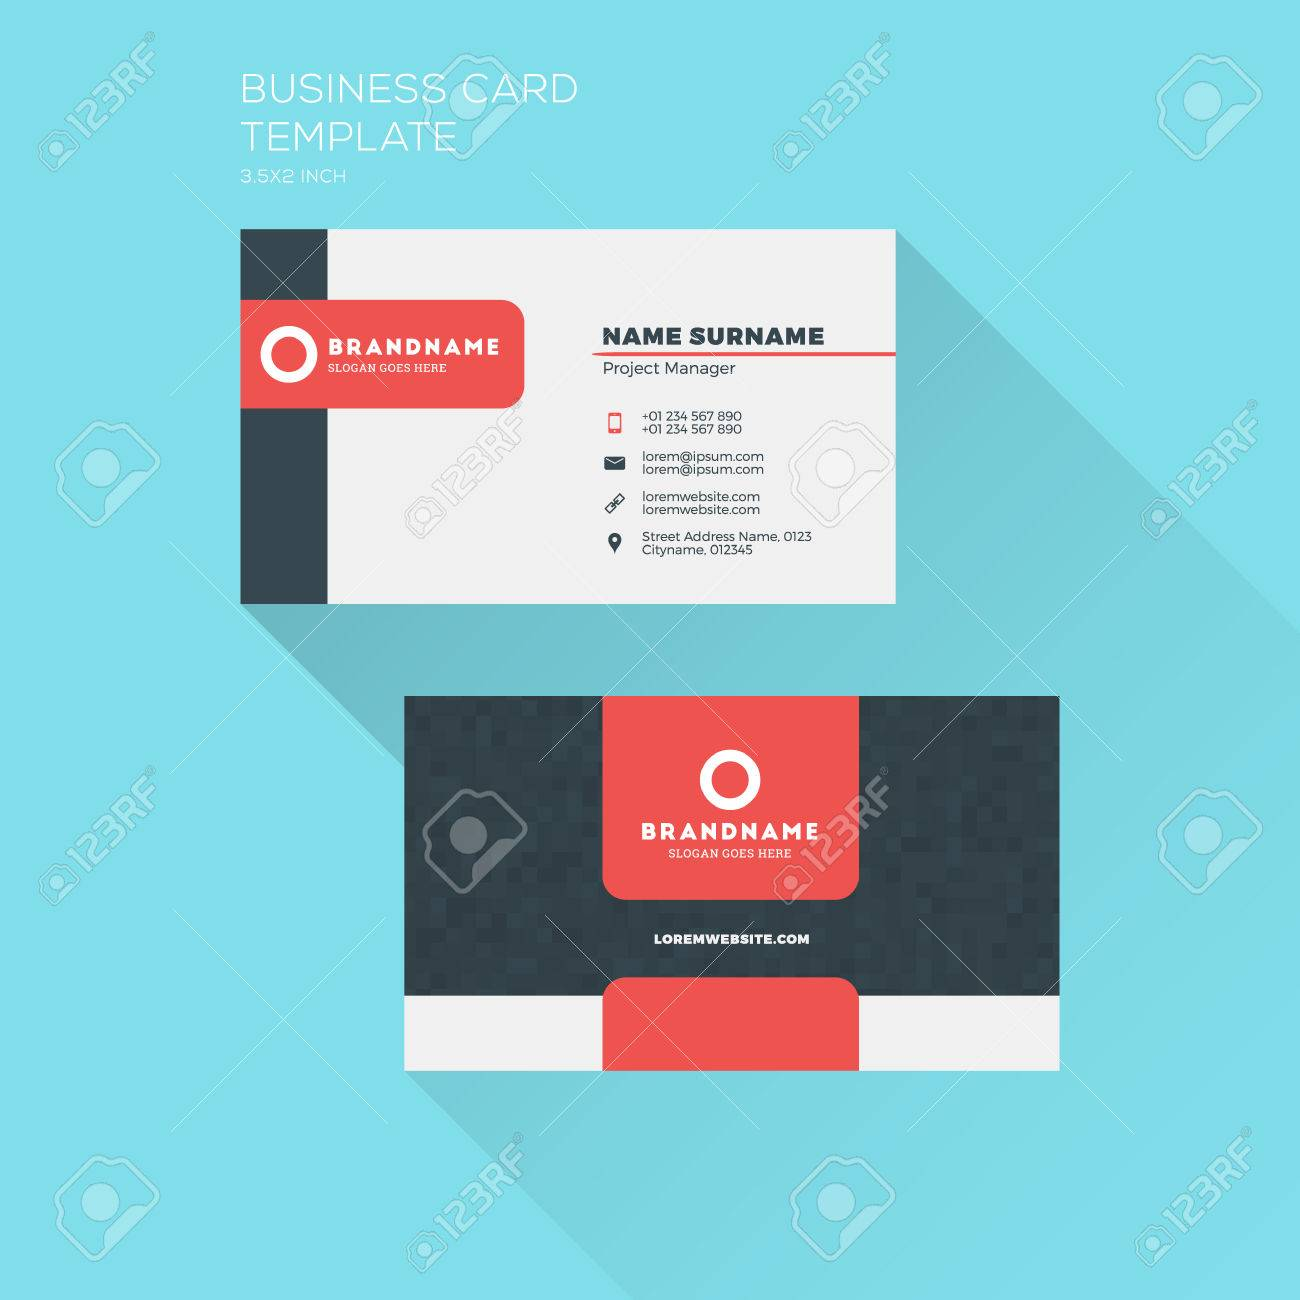 tarjetas de presentacion personal - Vatoz.atozdevelopment.co